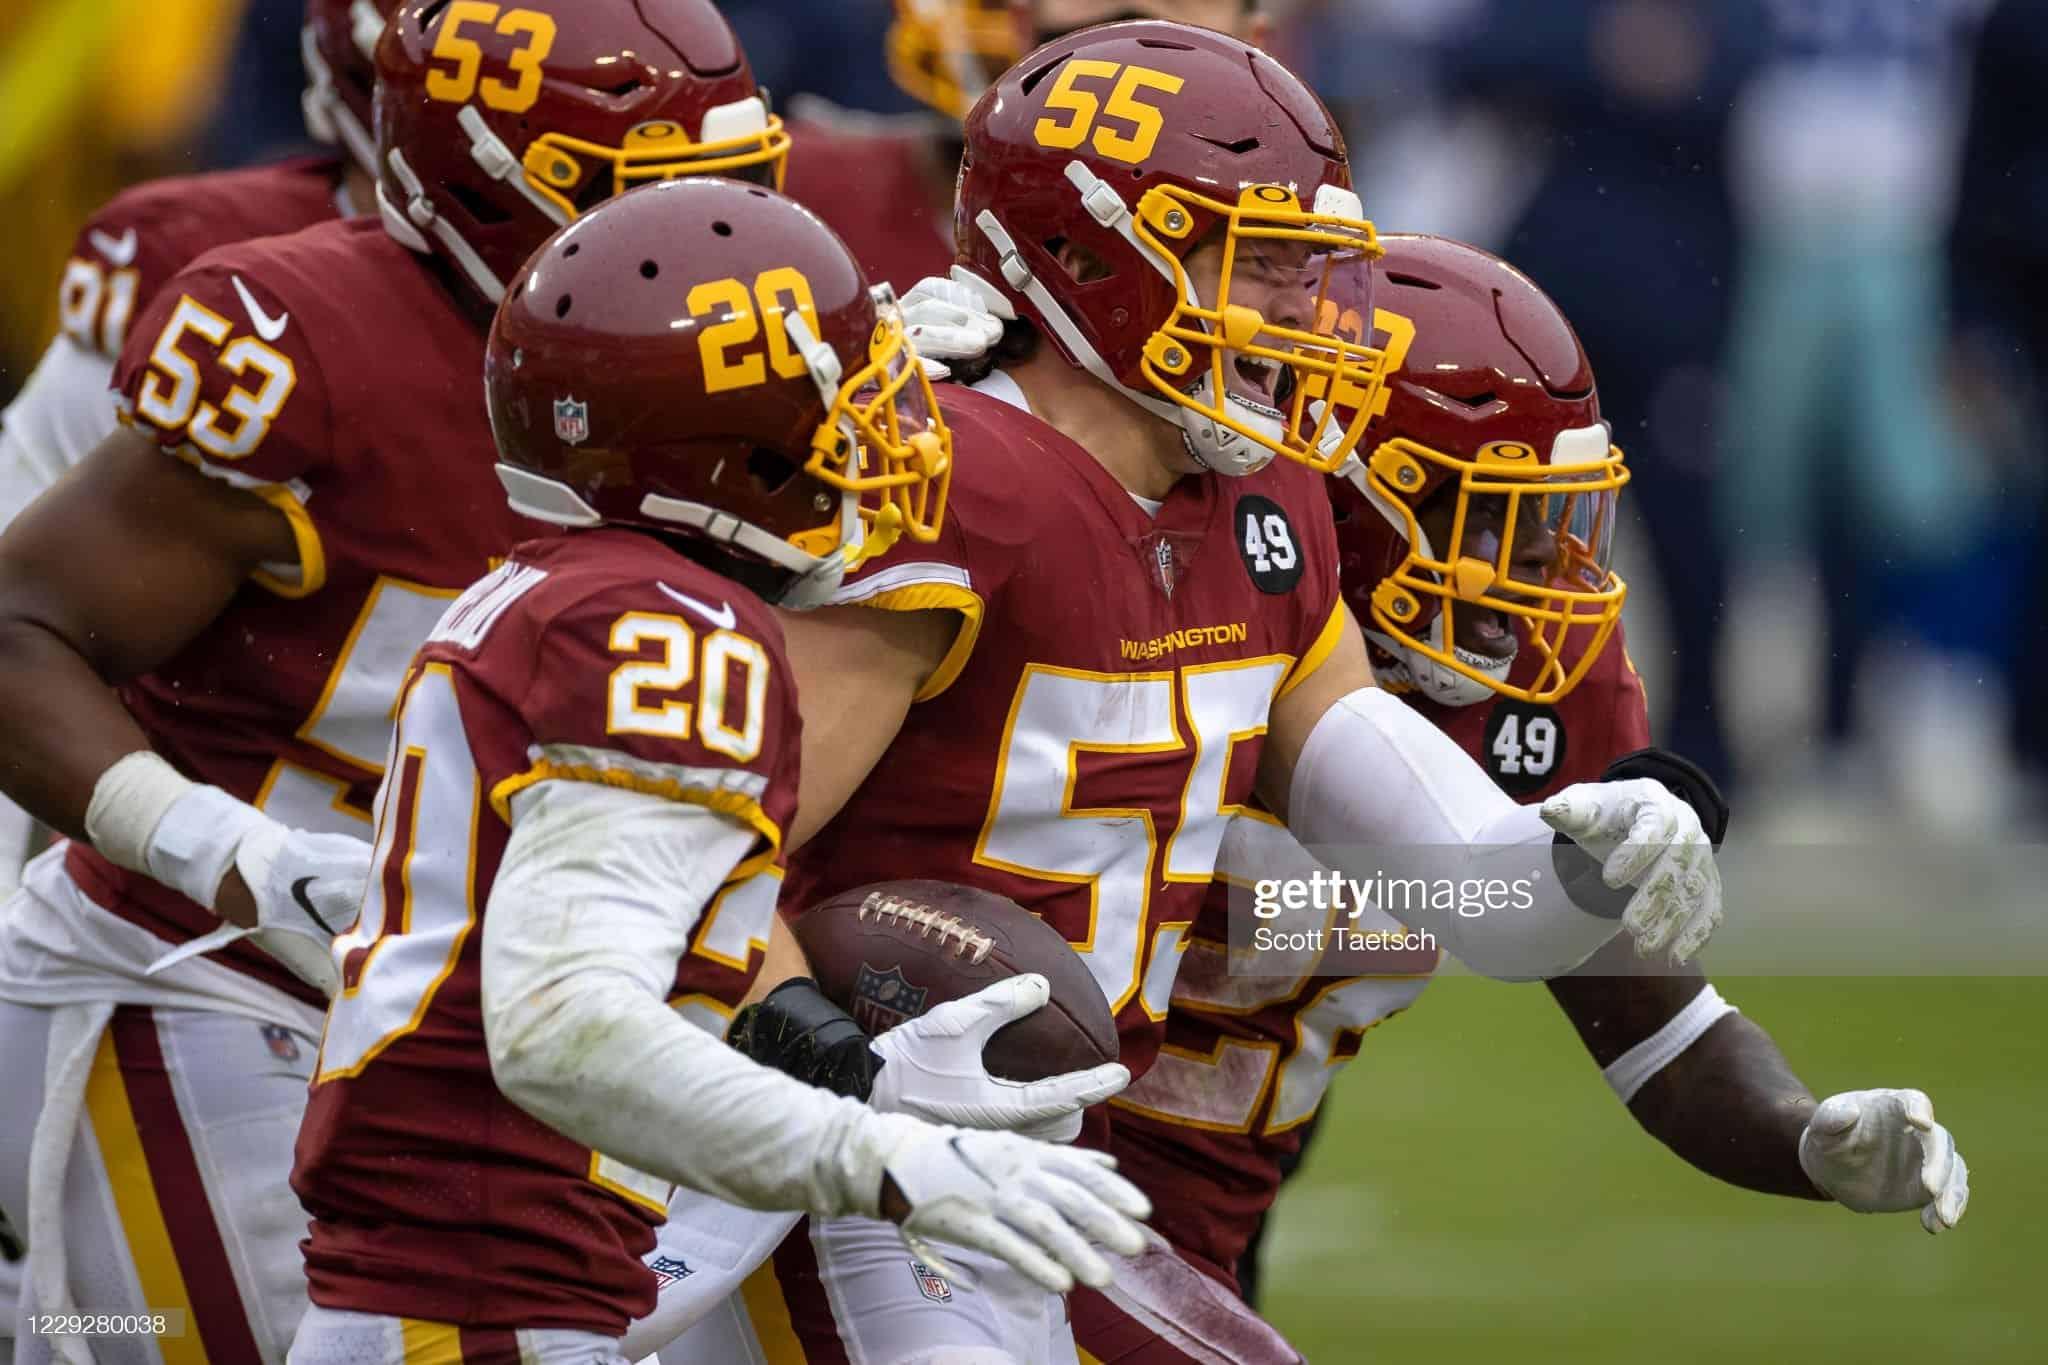 2021 NFL Predictions: Football Team